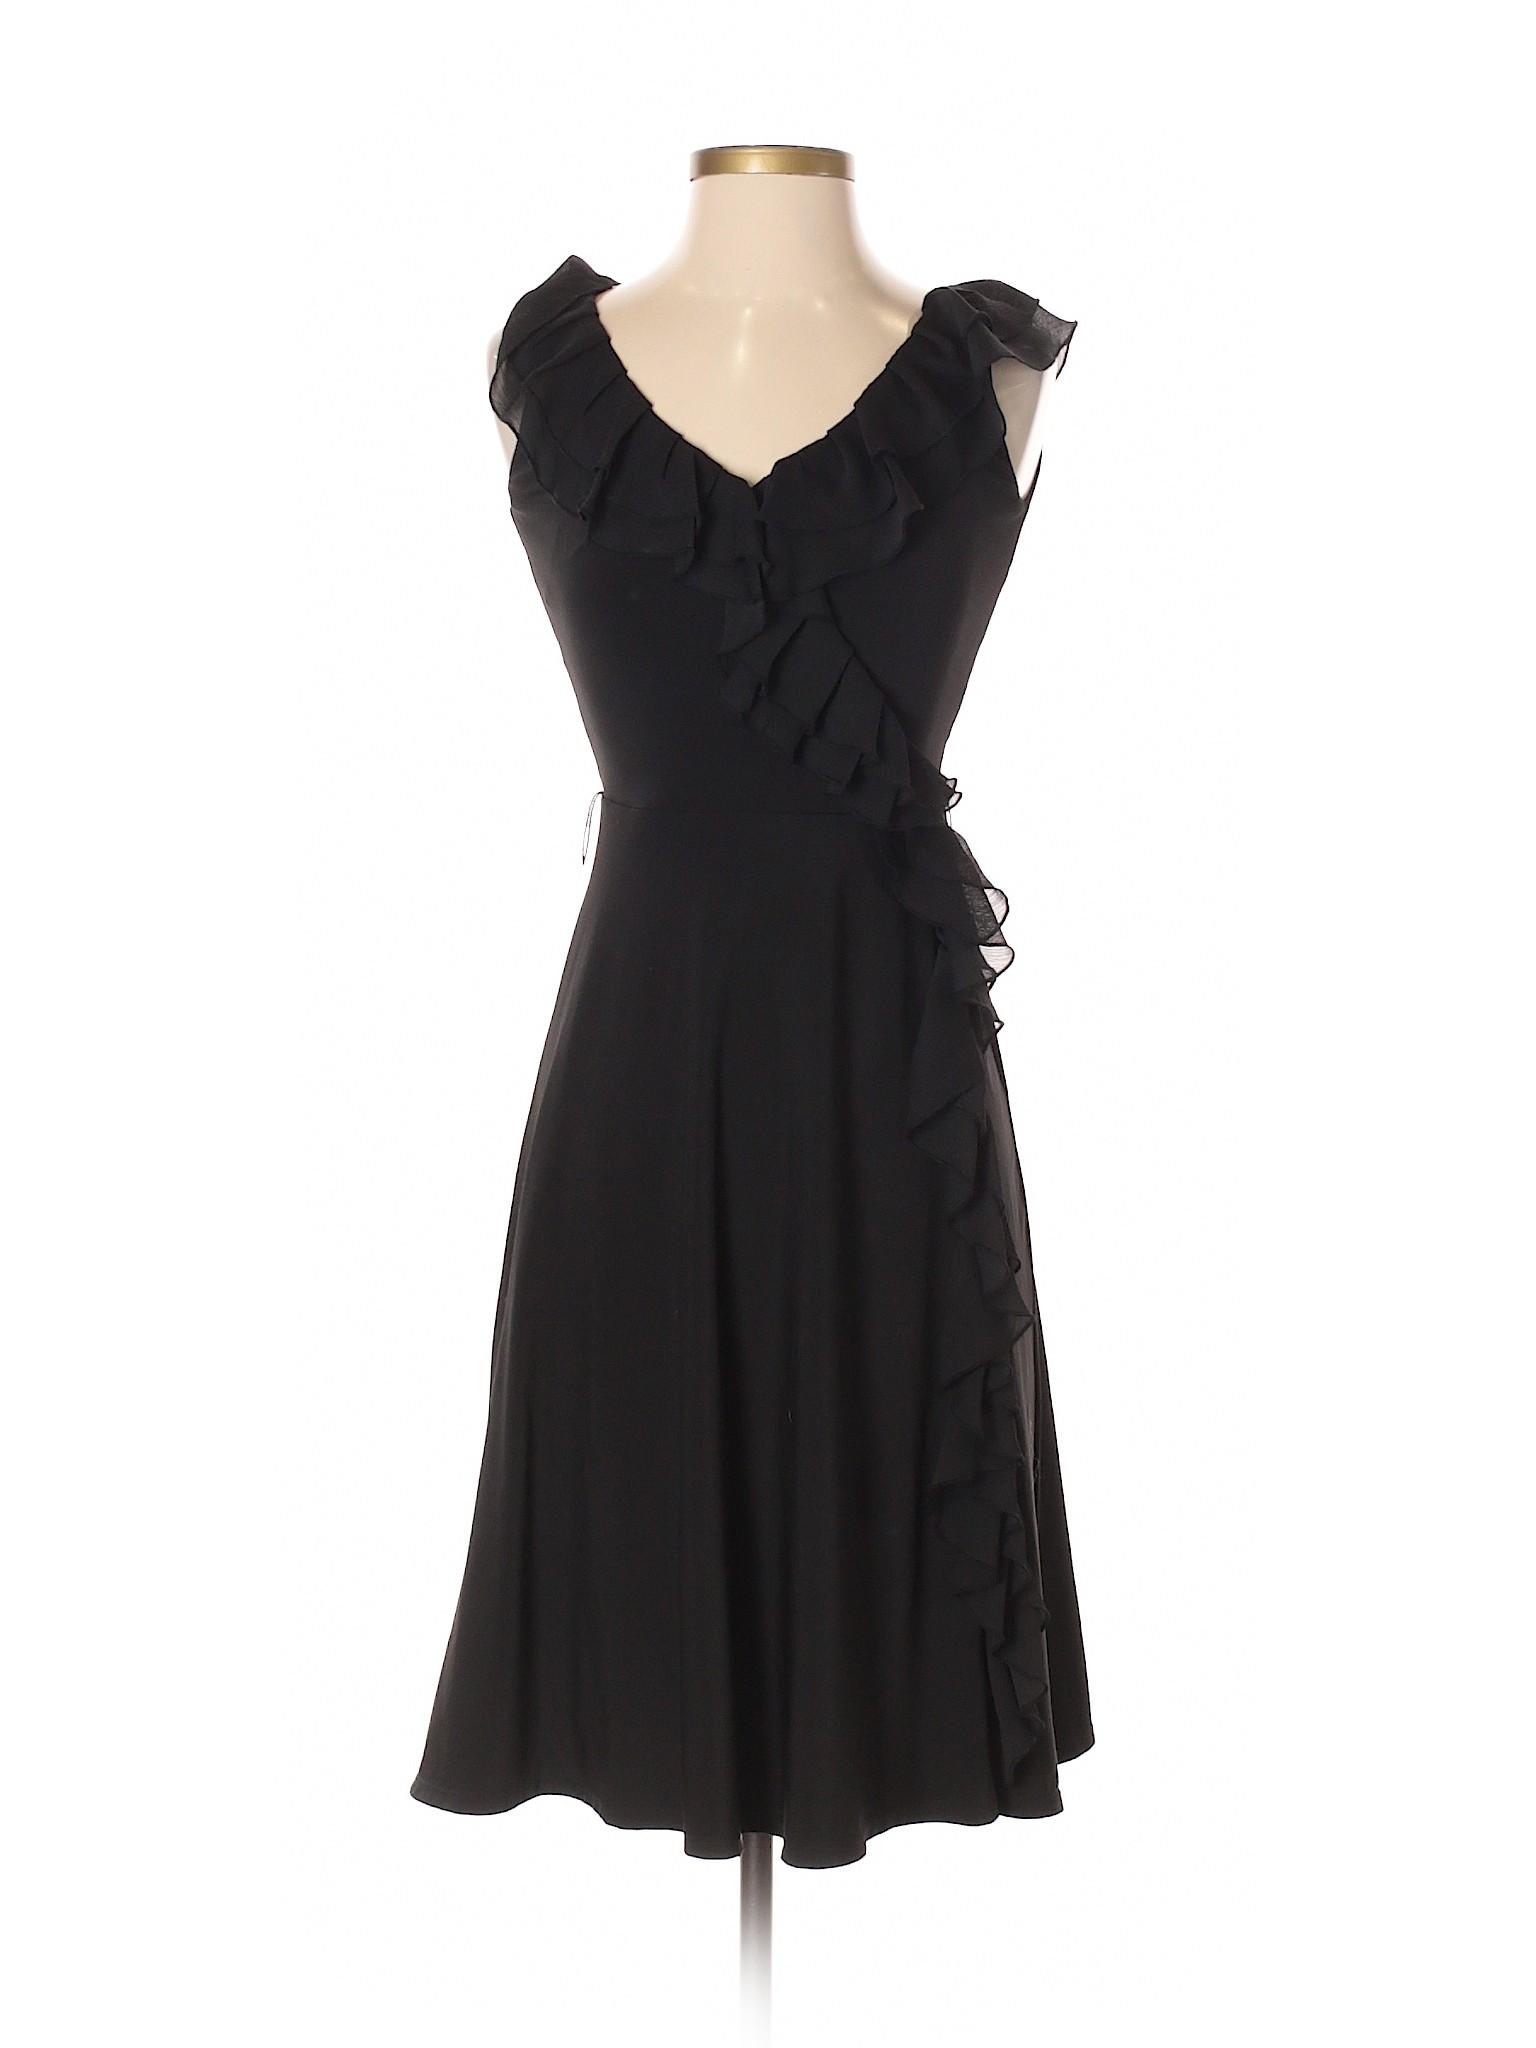 Black Market House Dress Boutique Casual White winter w0Oqqx7t